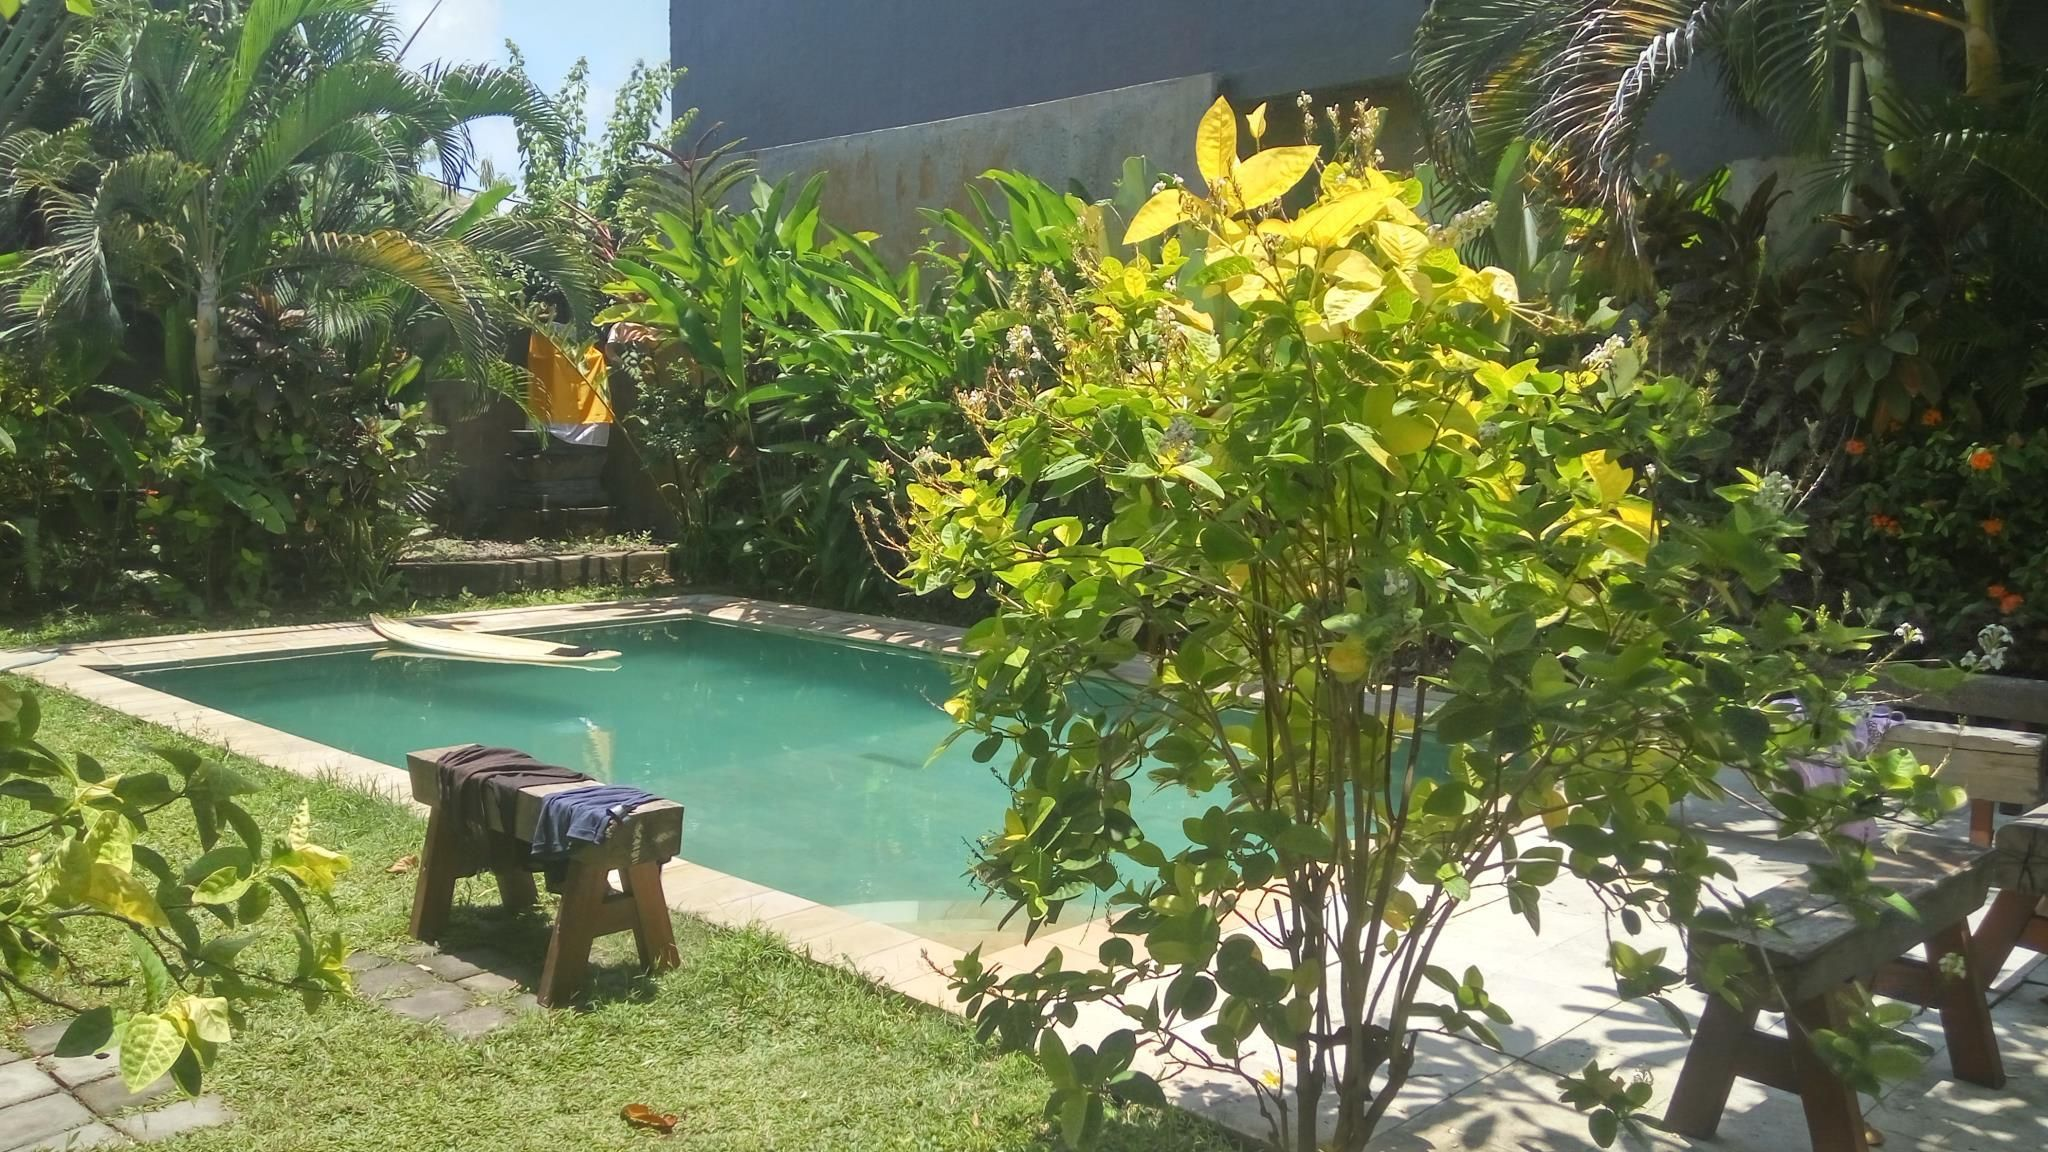 Berawa Beach Garden Hostel Bali Berawa Beach Garden Hostel is ...